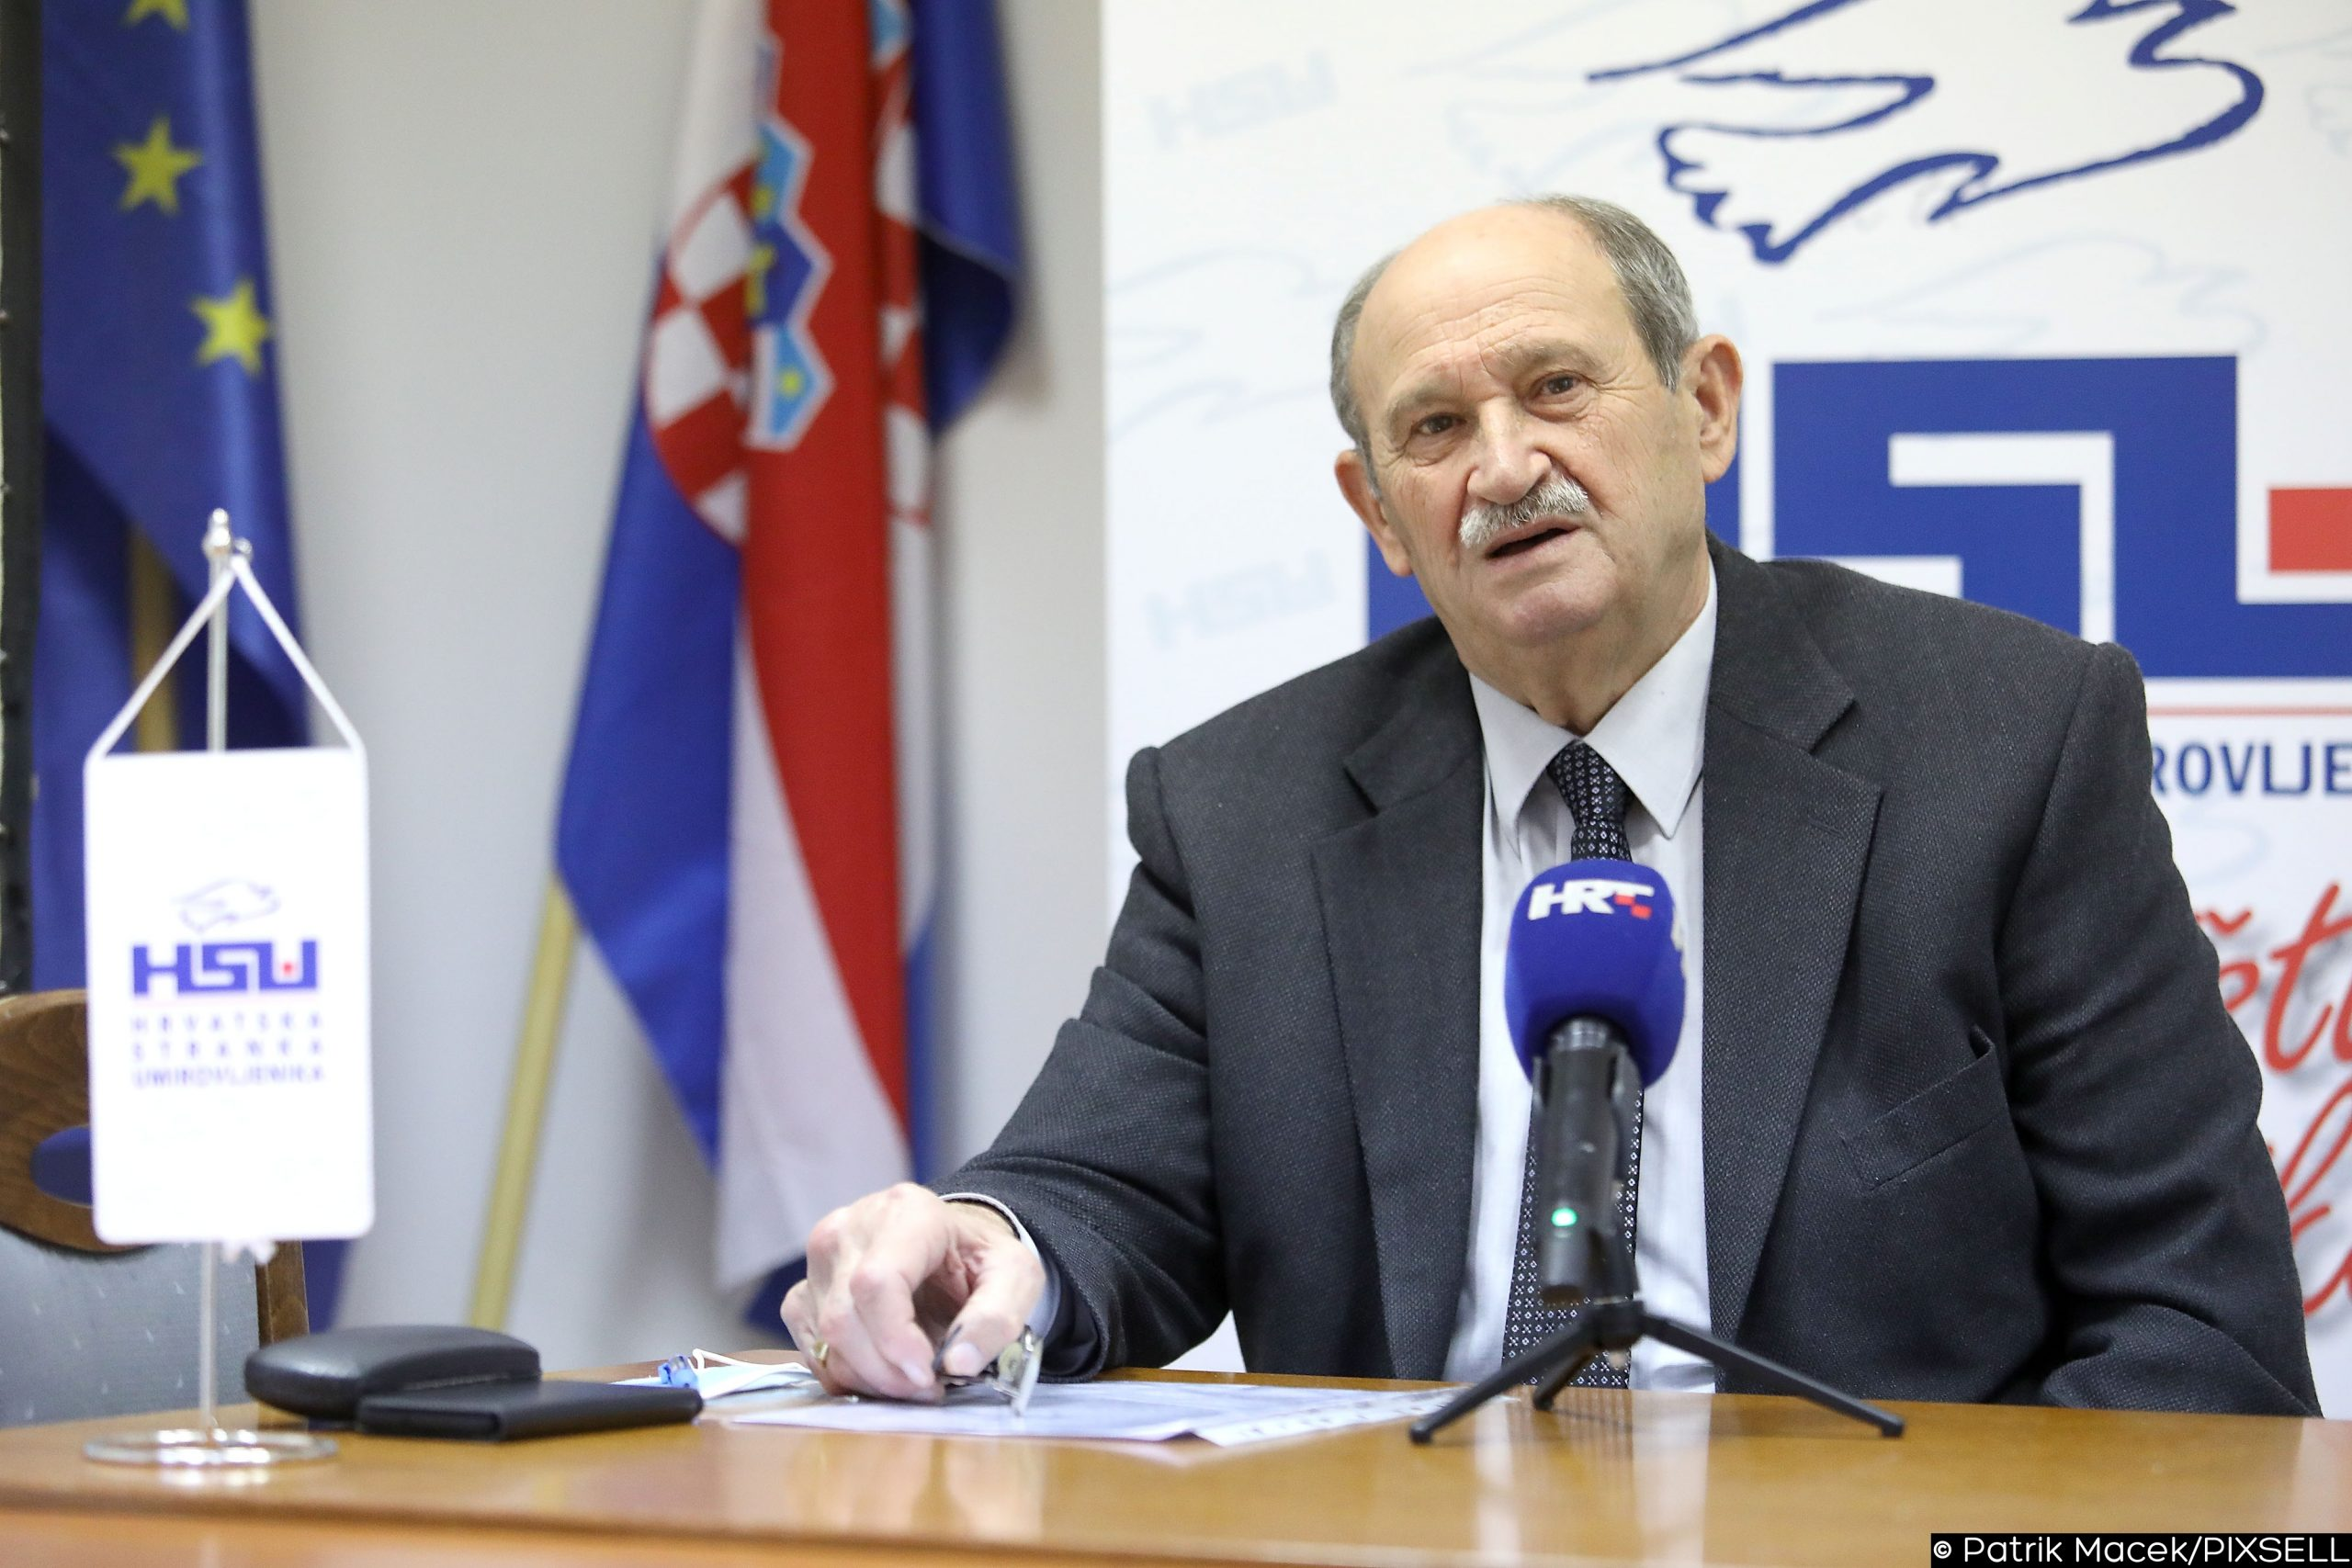 Veselko Gabričević / Foto PATRIK MACEK/PIXSELL